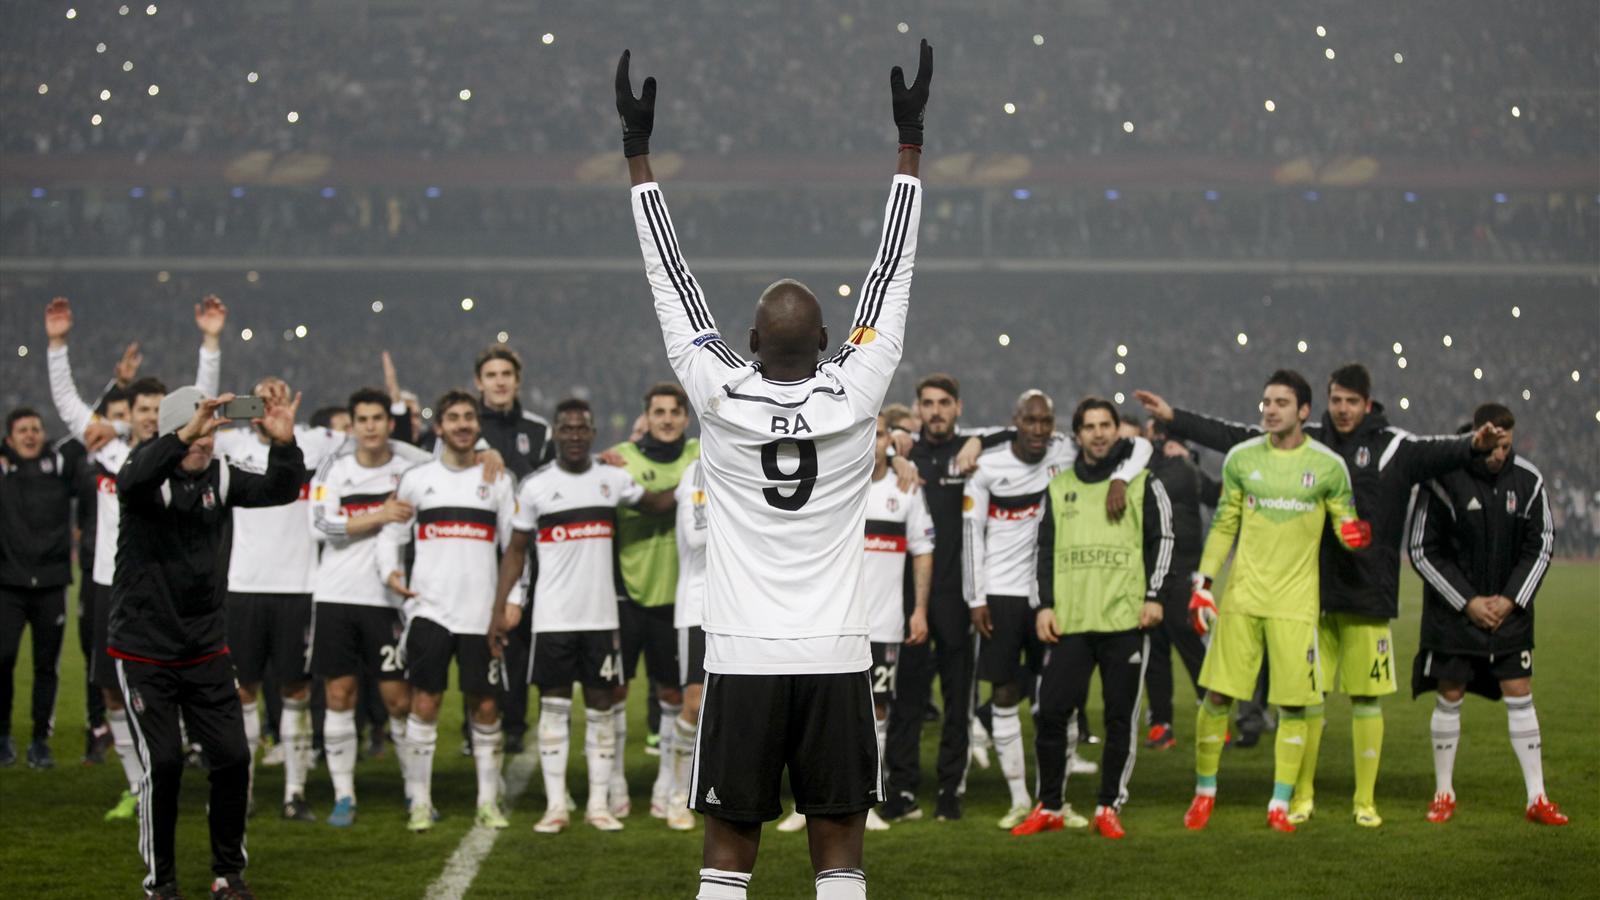 Club Brugge - Beşiktaş (ÖN BAKIŞ - MAÇ ÖZETİ - CANLI ANLATIM - ANALİZ - KADROLAR)